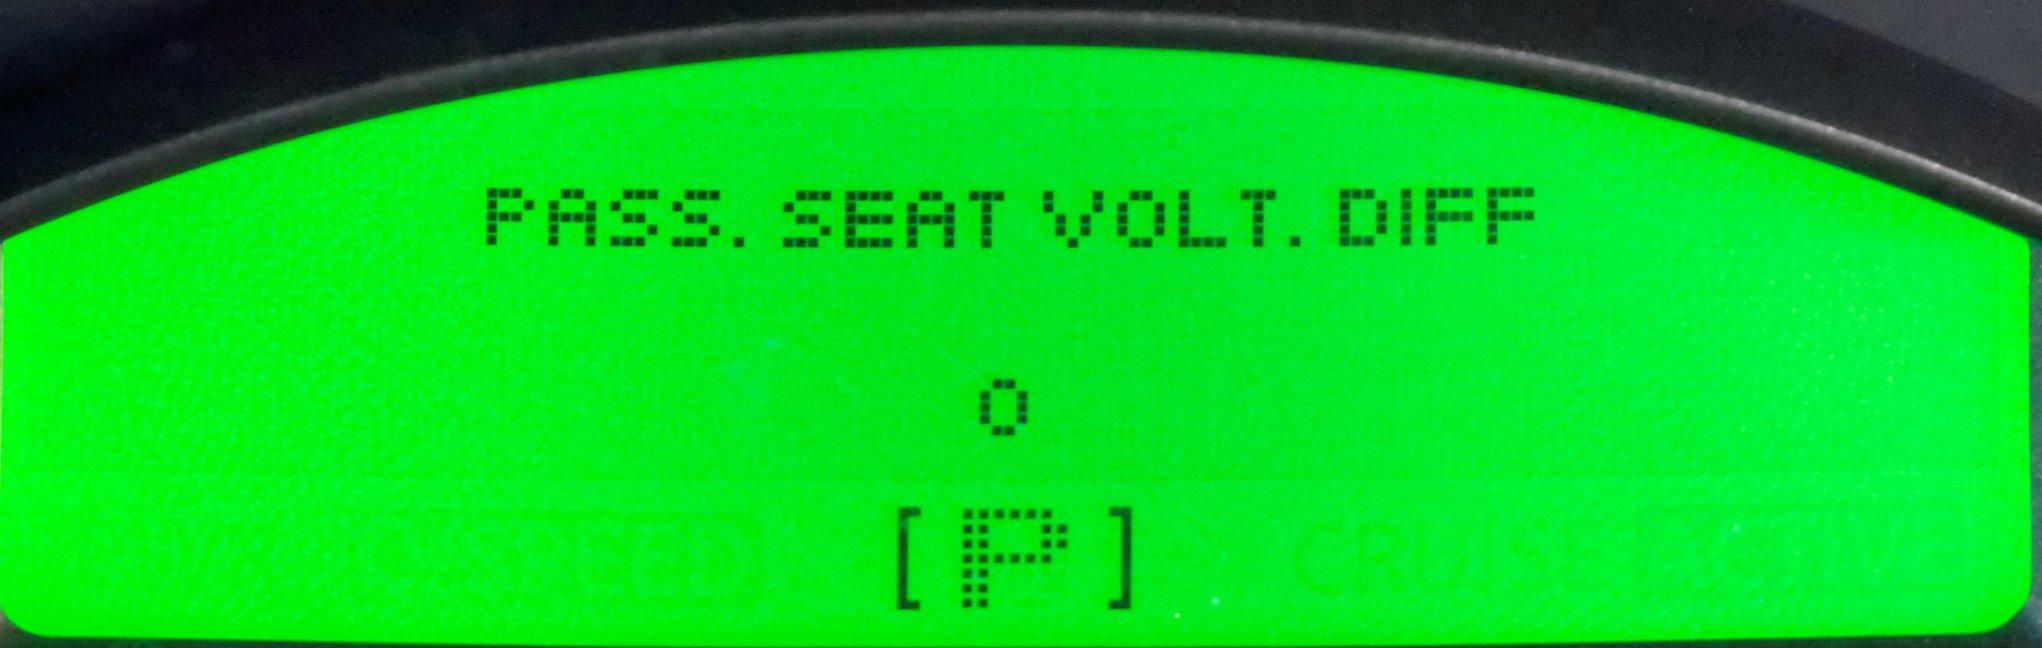 Trip-computer-10.jpeg